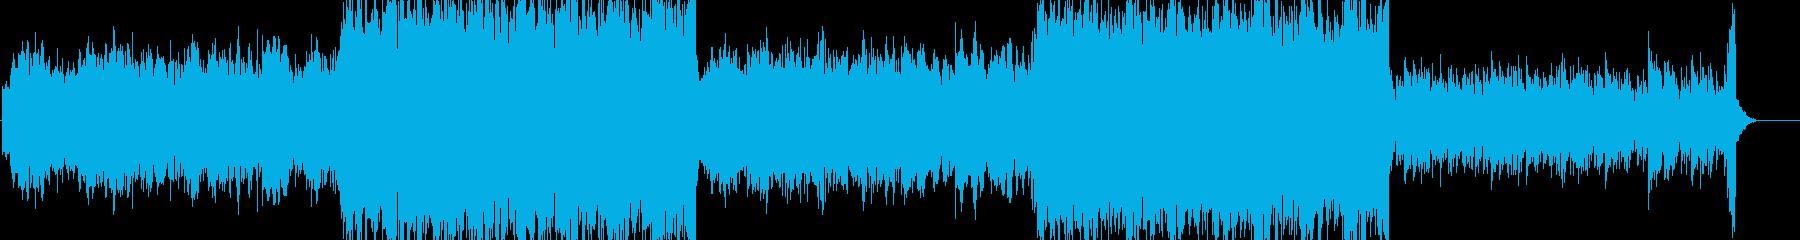 Suspense Orchestraの再生済みの波形